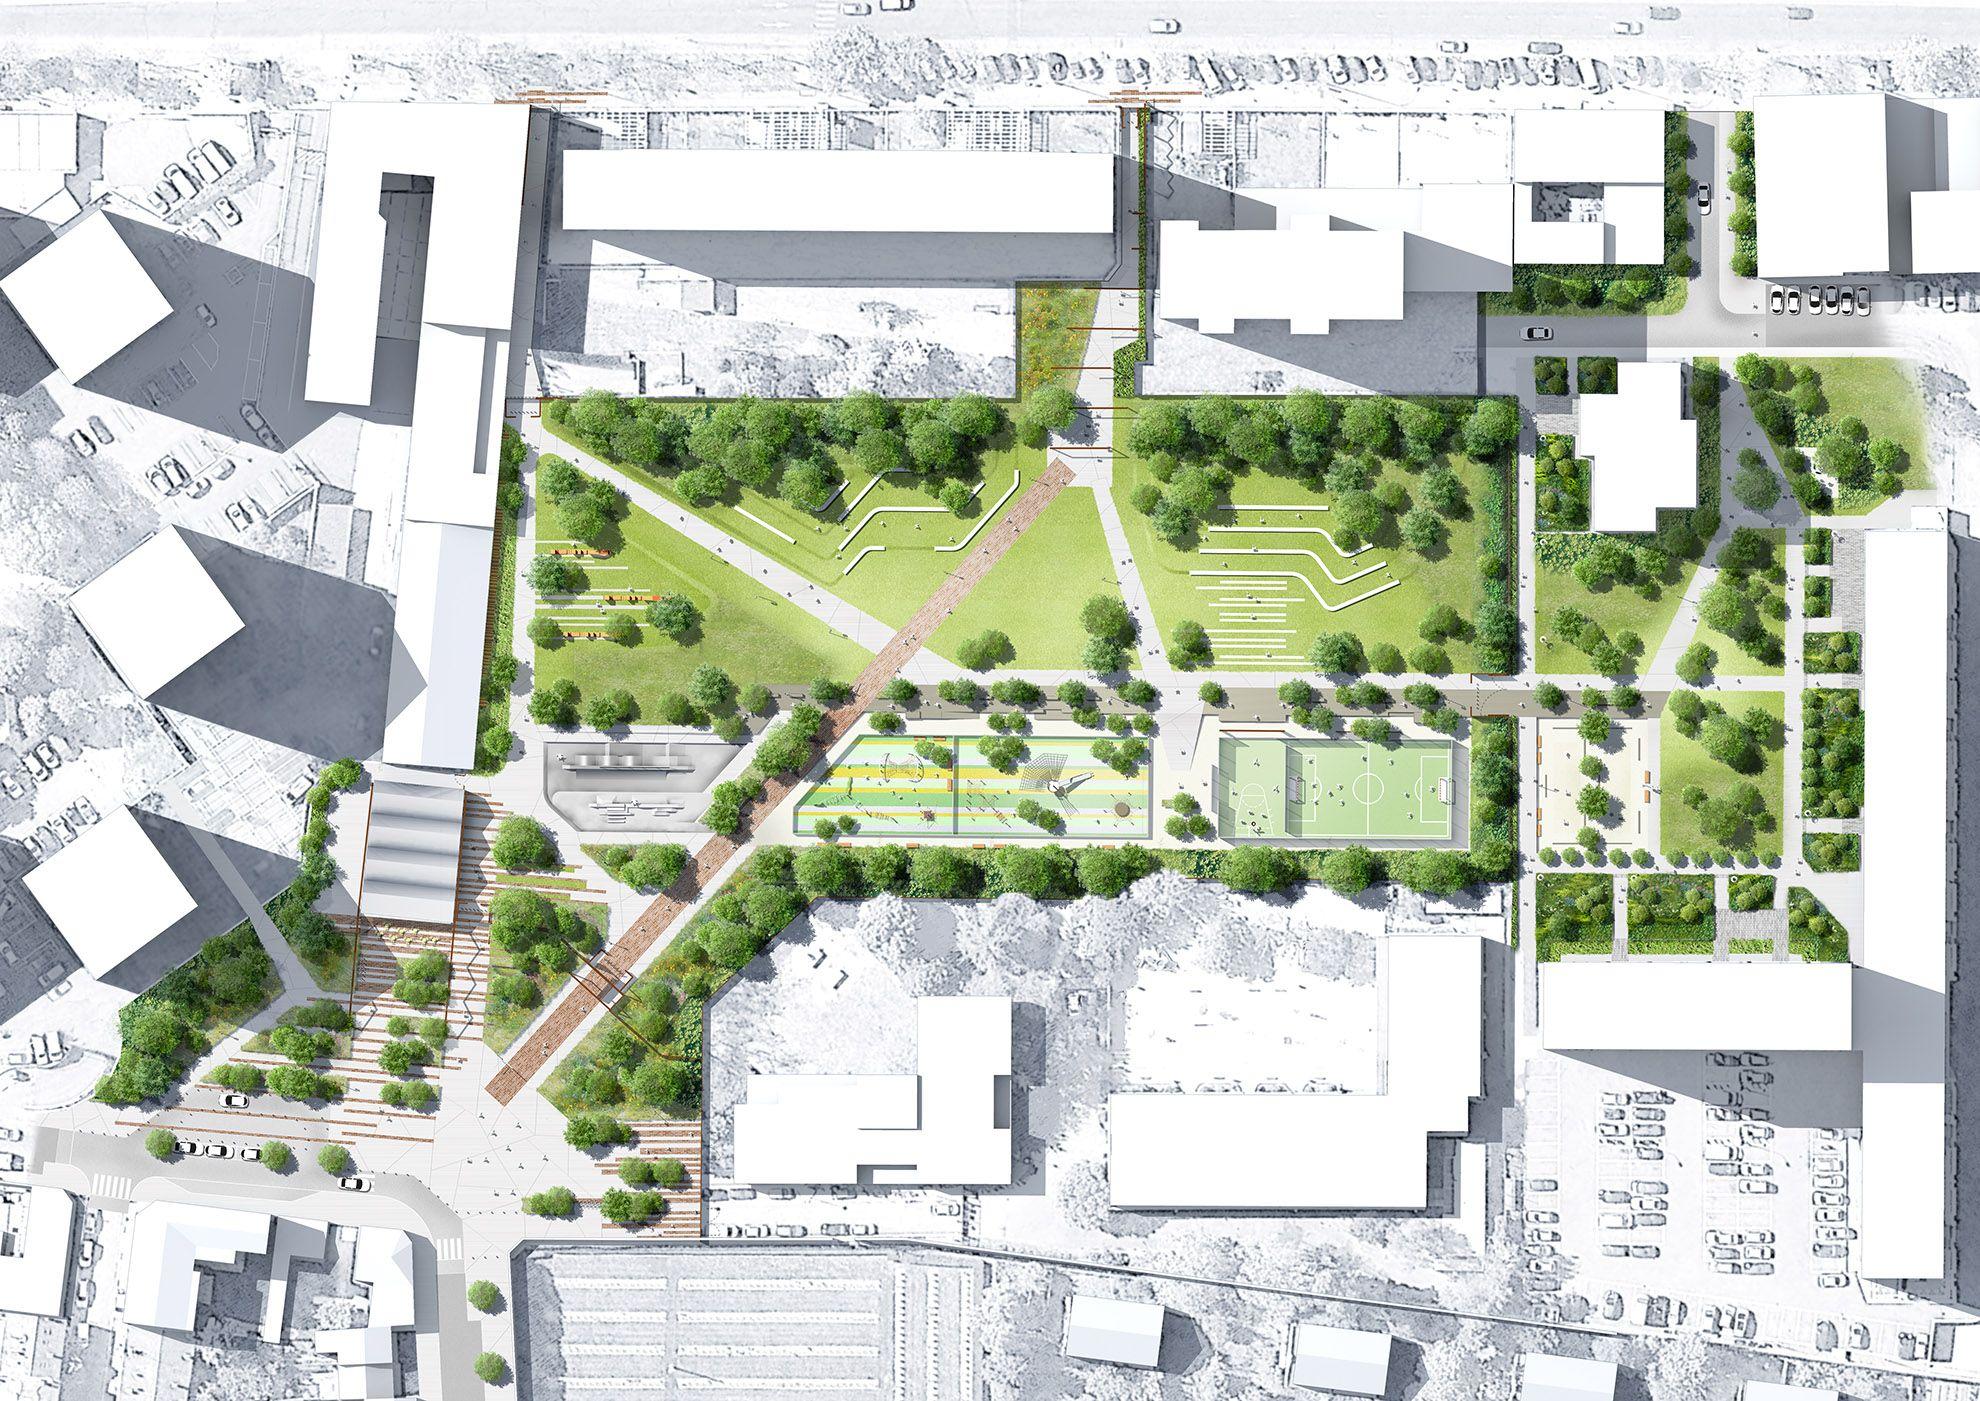 Plan masse du parc diderot graphisme pinterest plan for Plan masse architecture